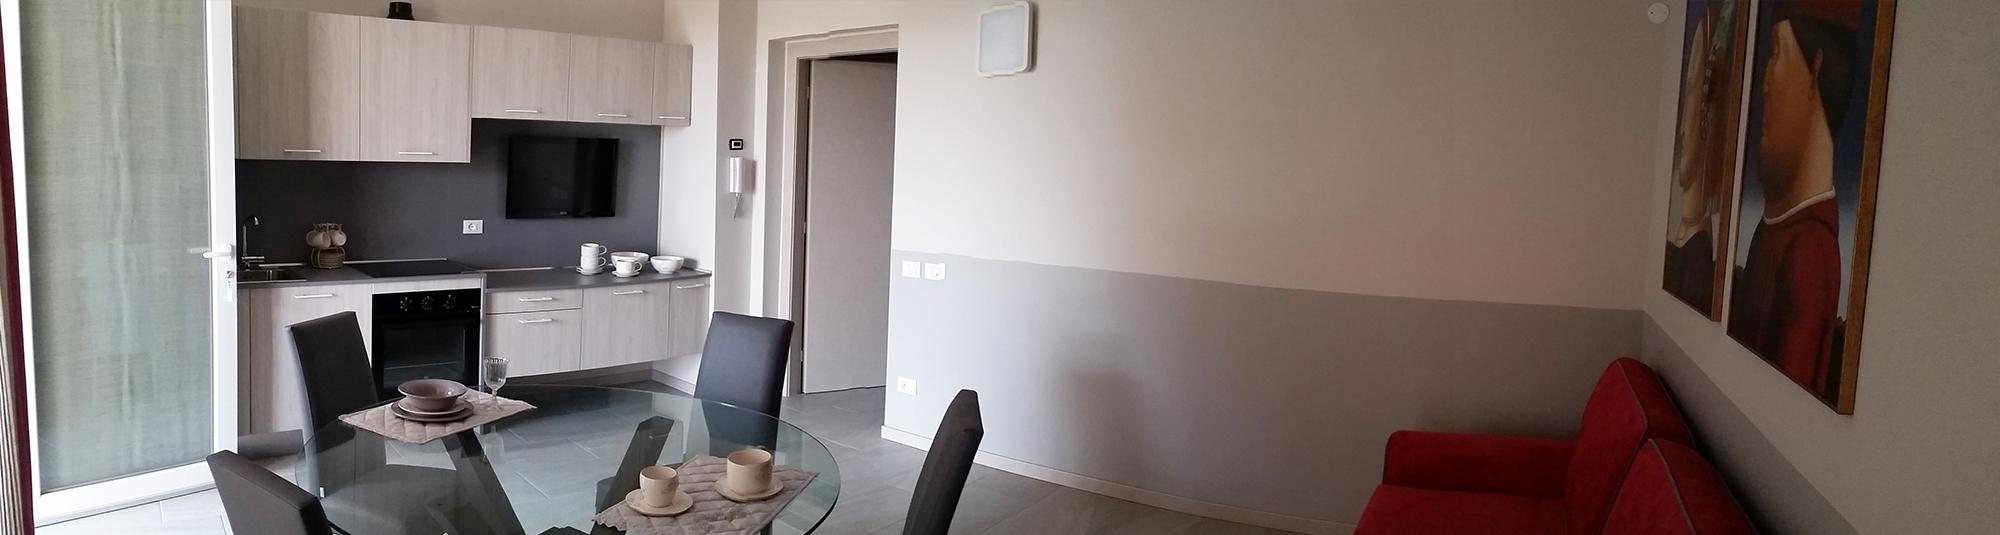 Appartamento Lara